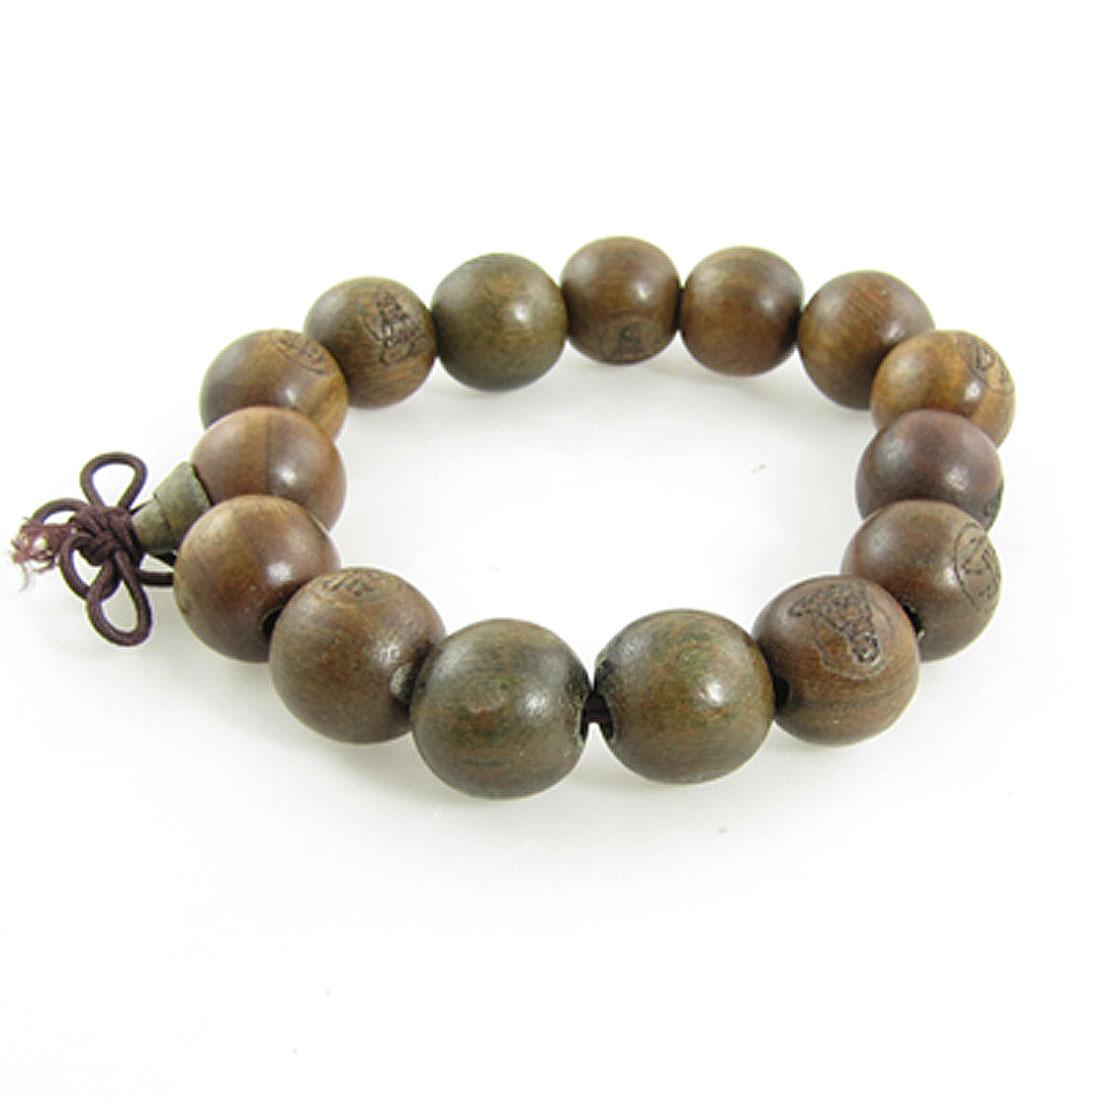 Buddhist Brown Wooden Carved Prayer Beads Wrist Mala Bracelet